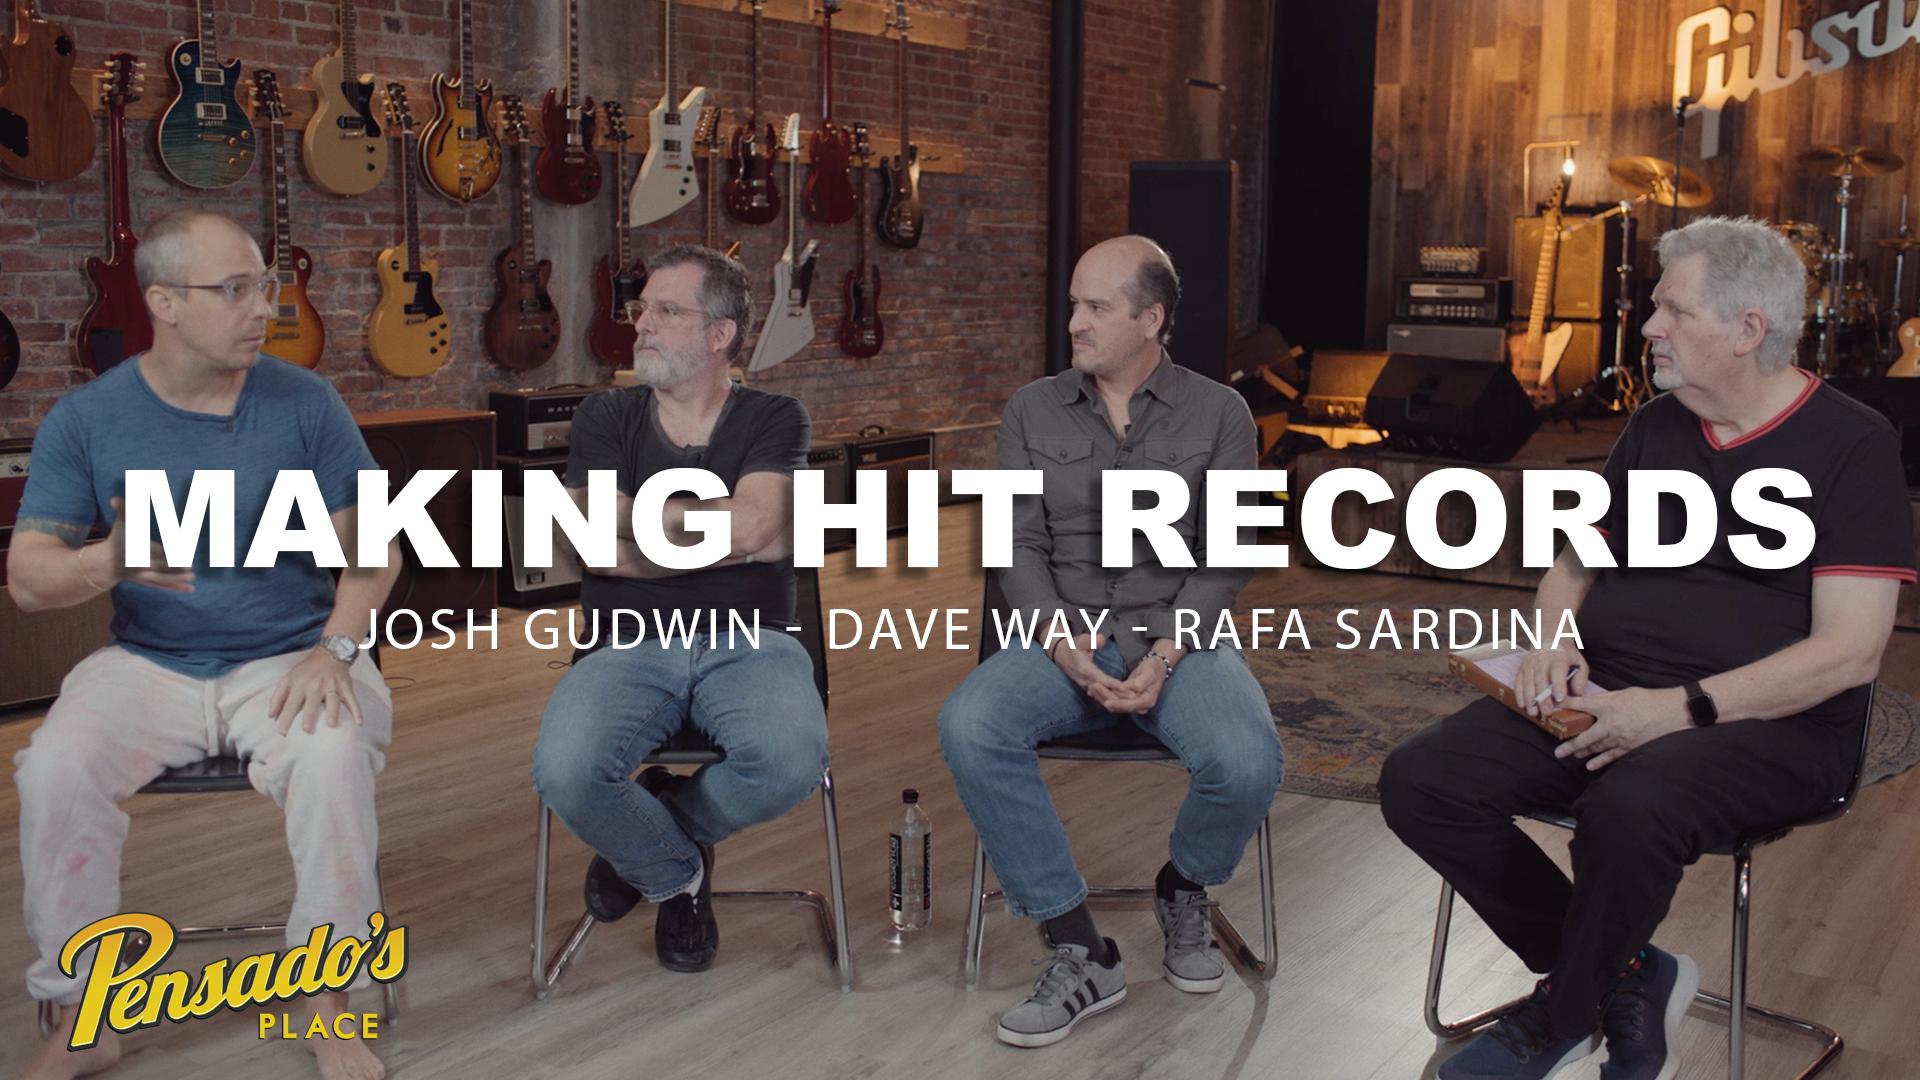 Making Hit Records with Josh Gudwin, Dave Way & Rafa Sardina